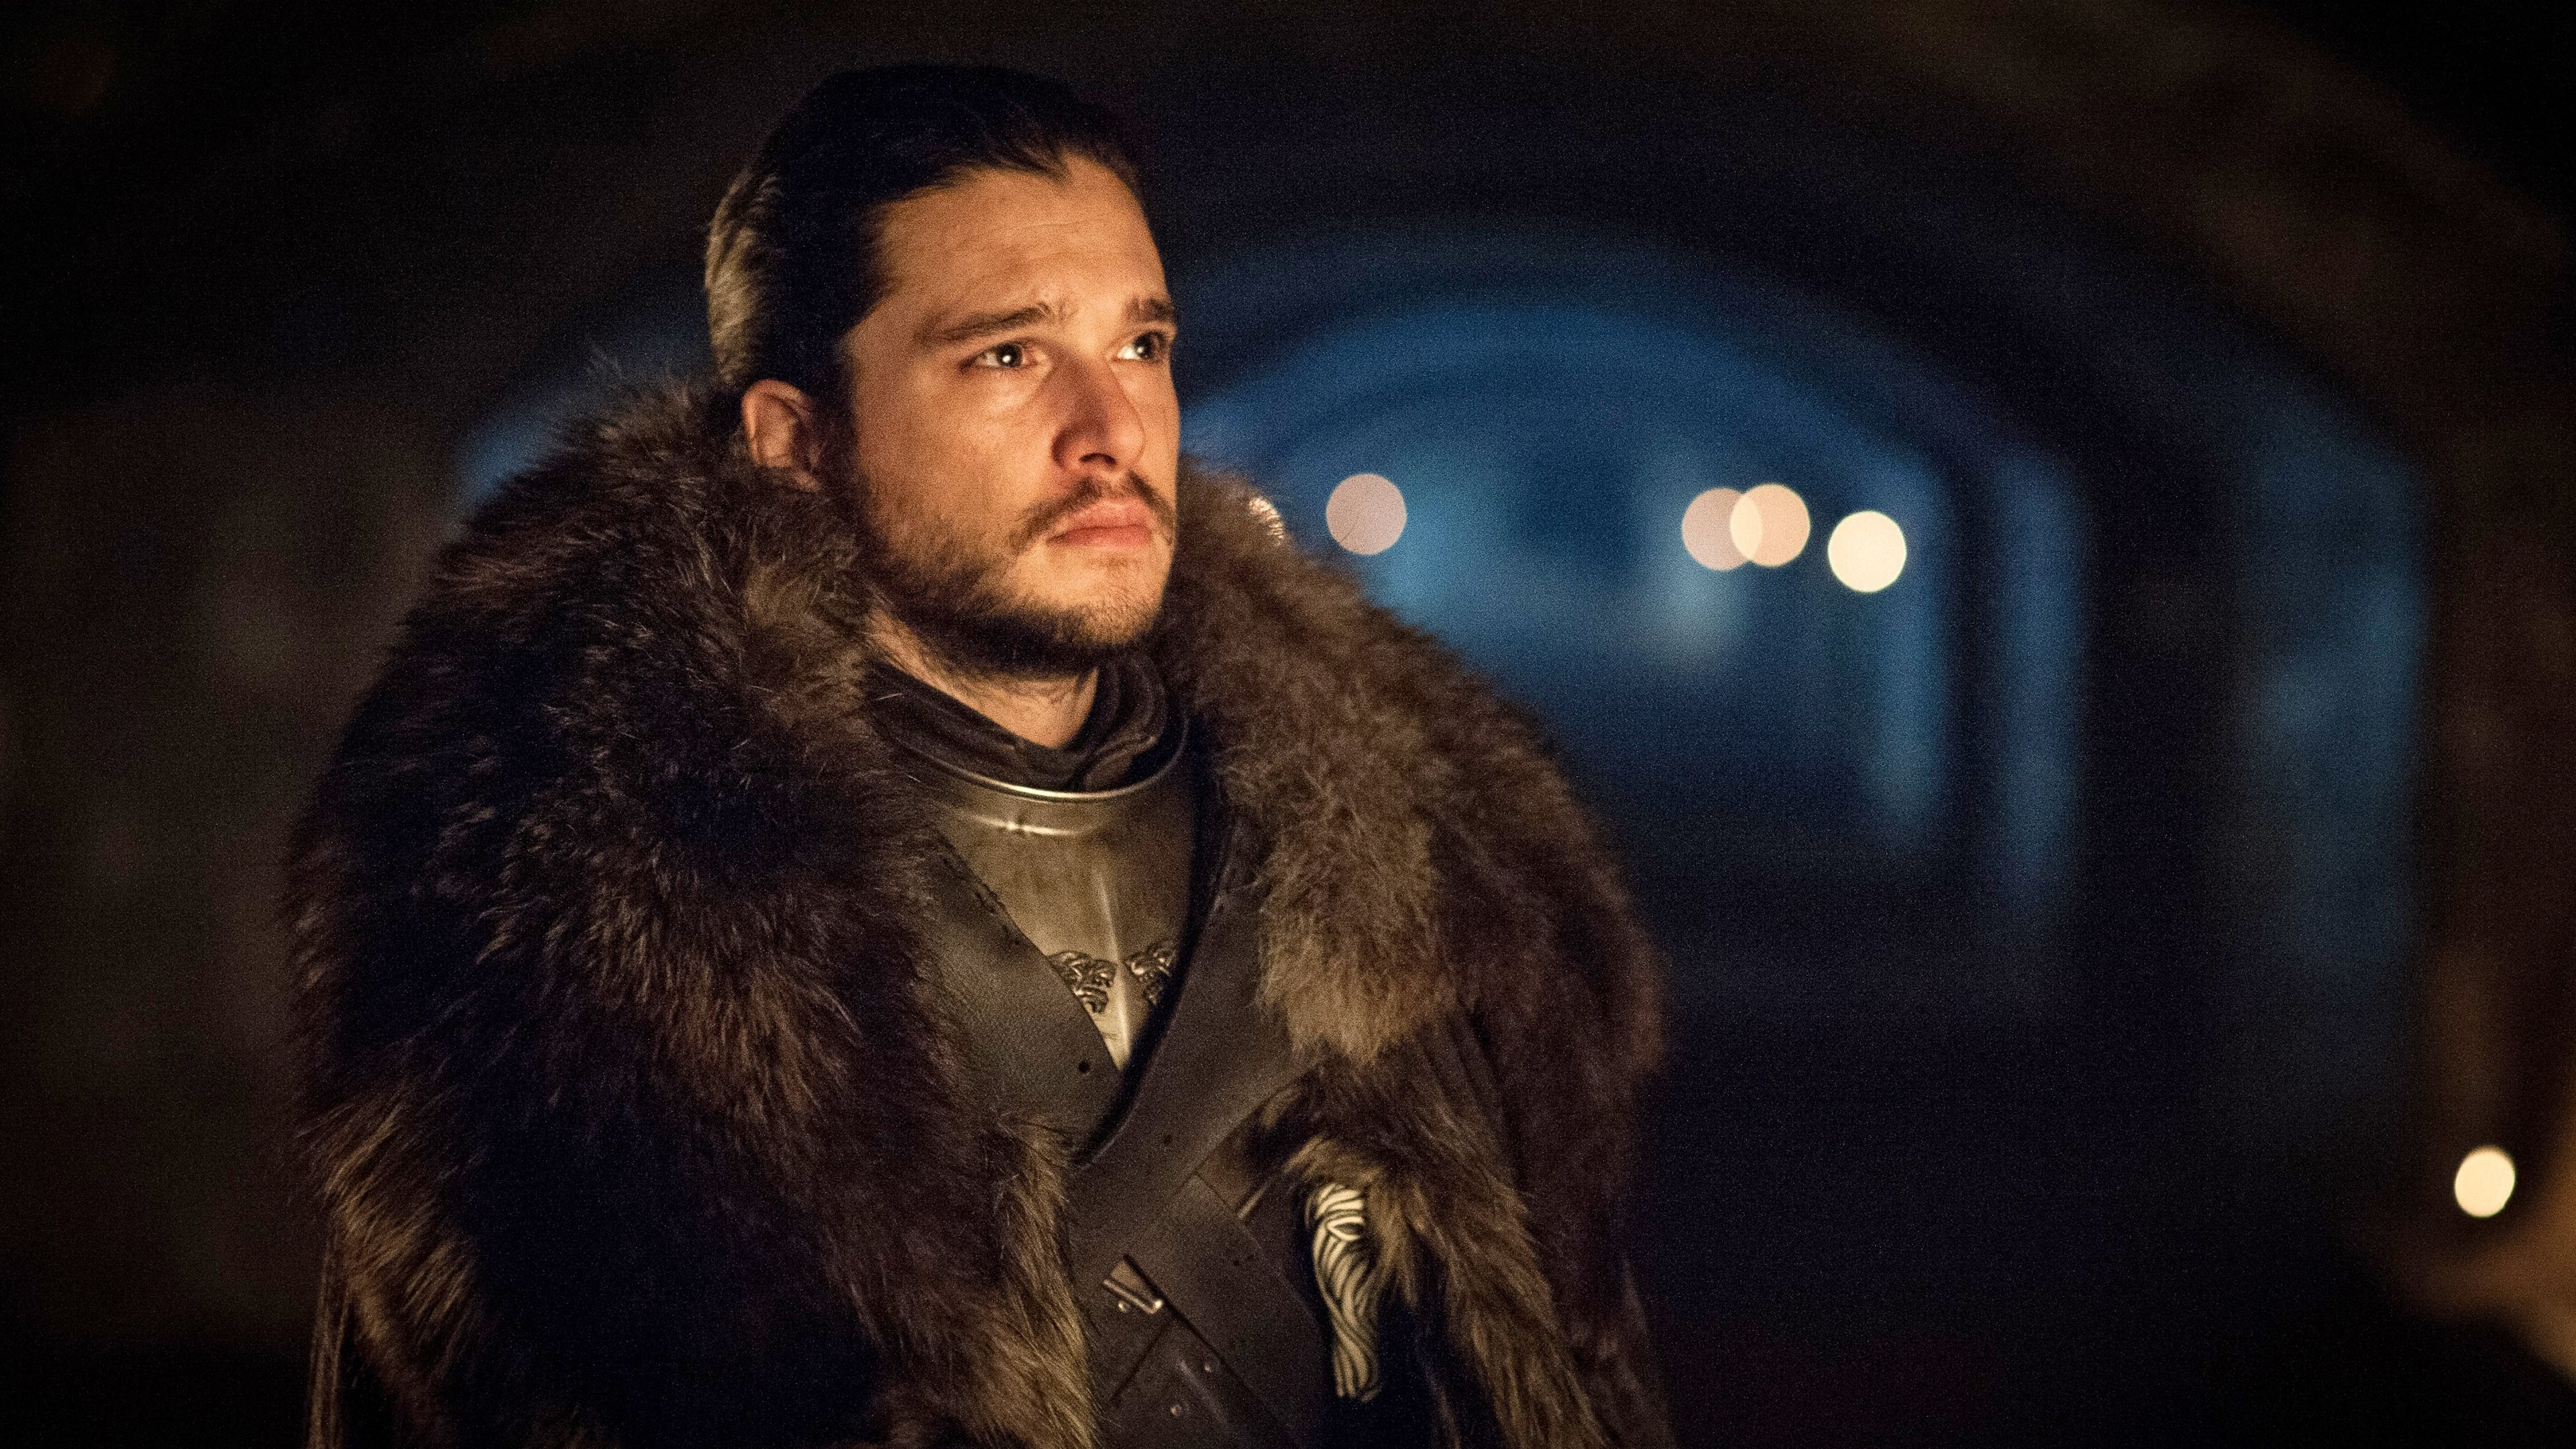 Game of Thrones Season 7 Episode 2 Watch Online - Watch Series Online